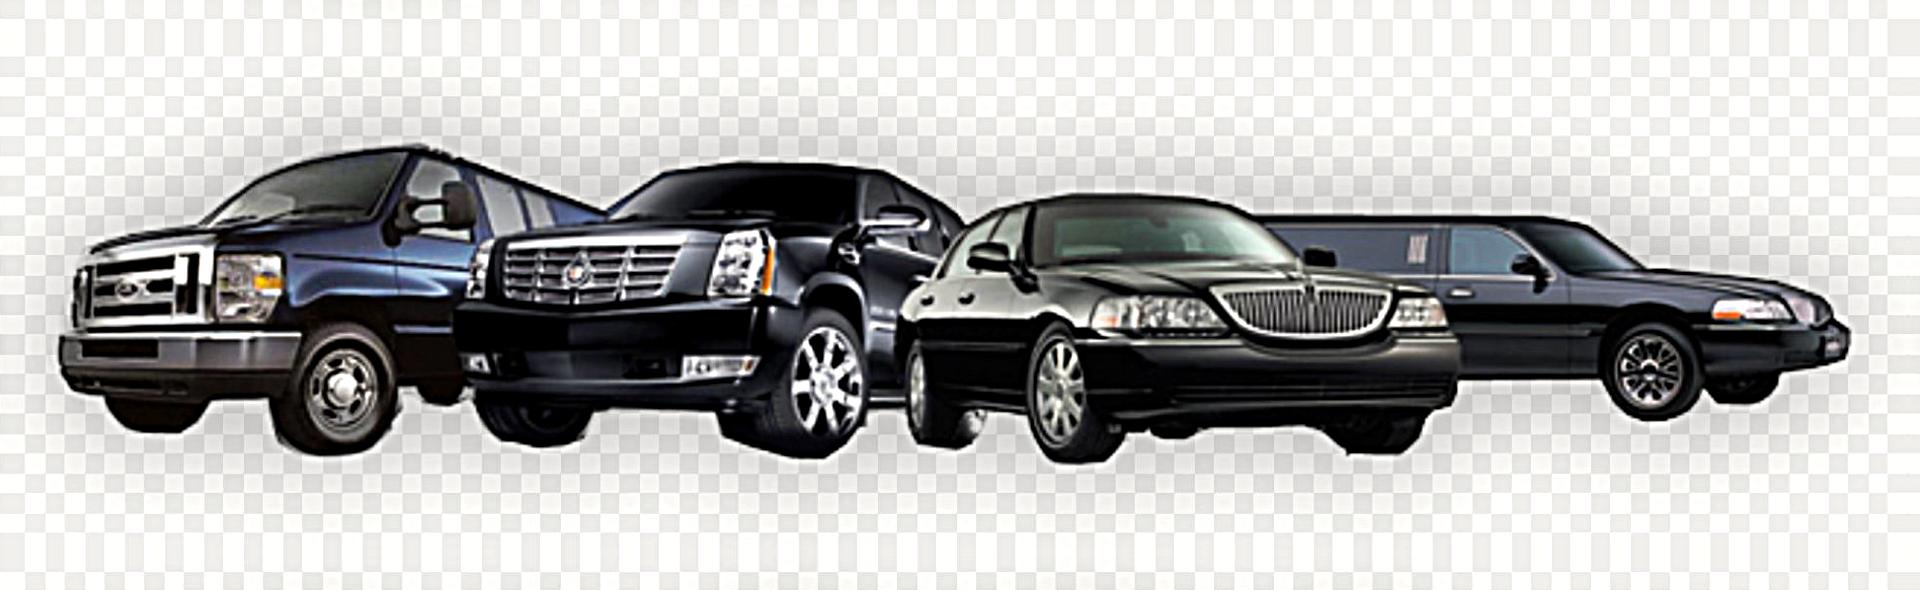 4 black cars